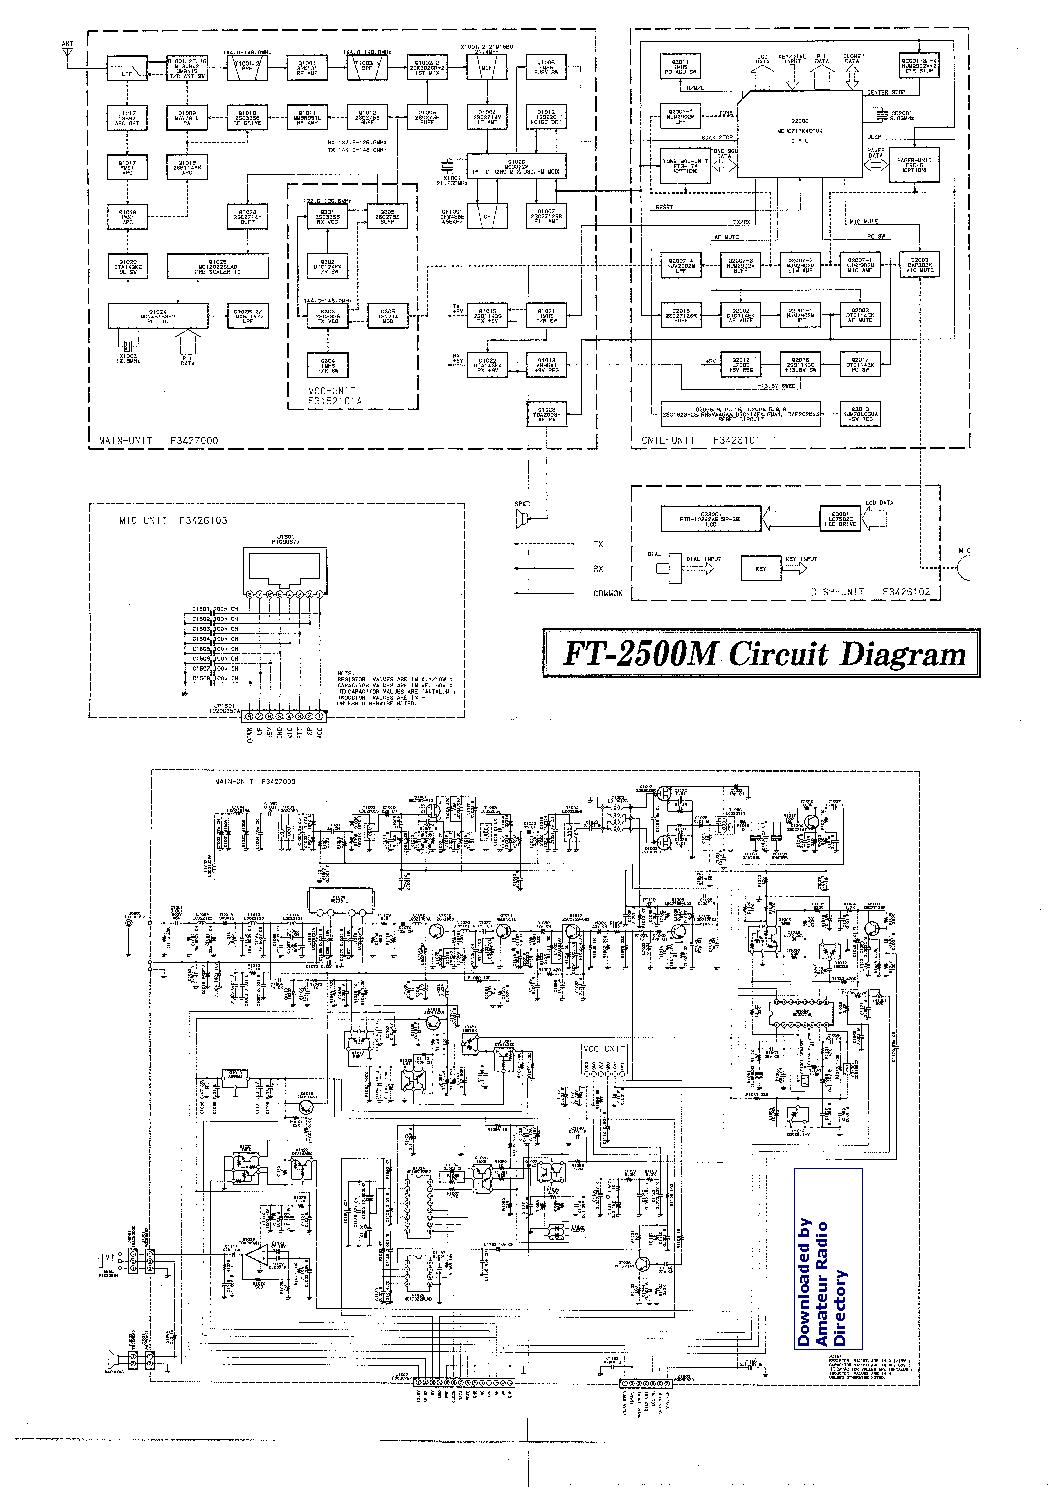 Yaesu Ft2500m Service Manual Download  Schematics  Eeprom